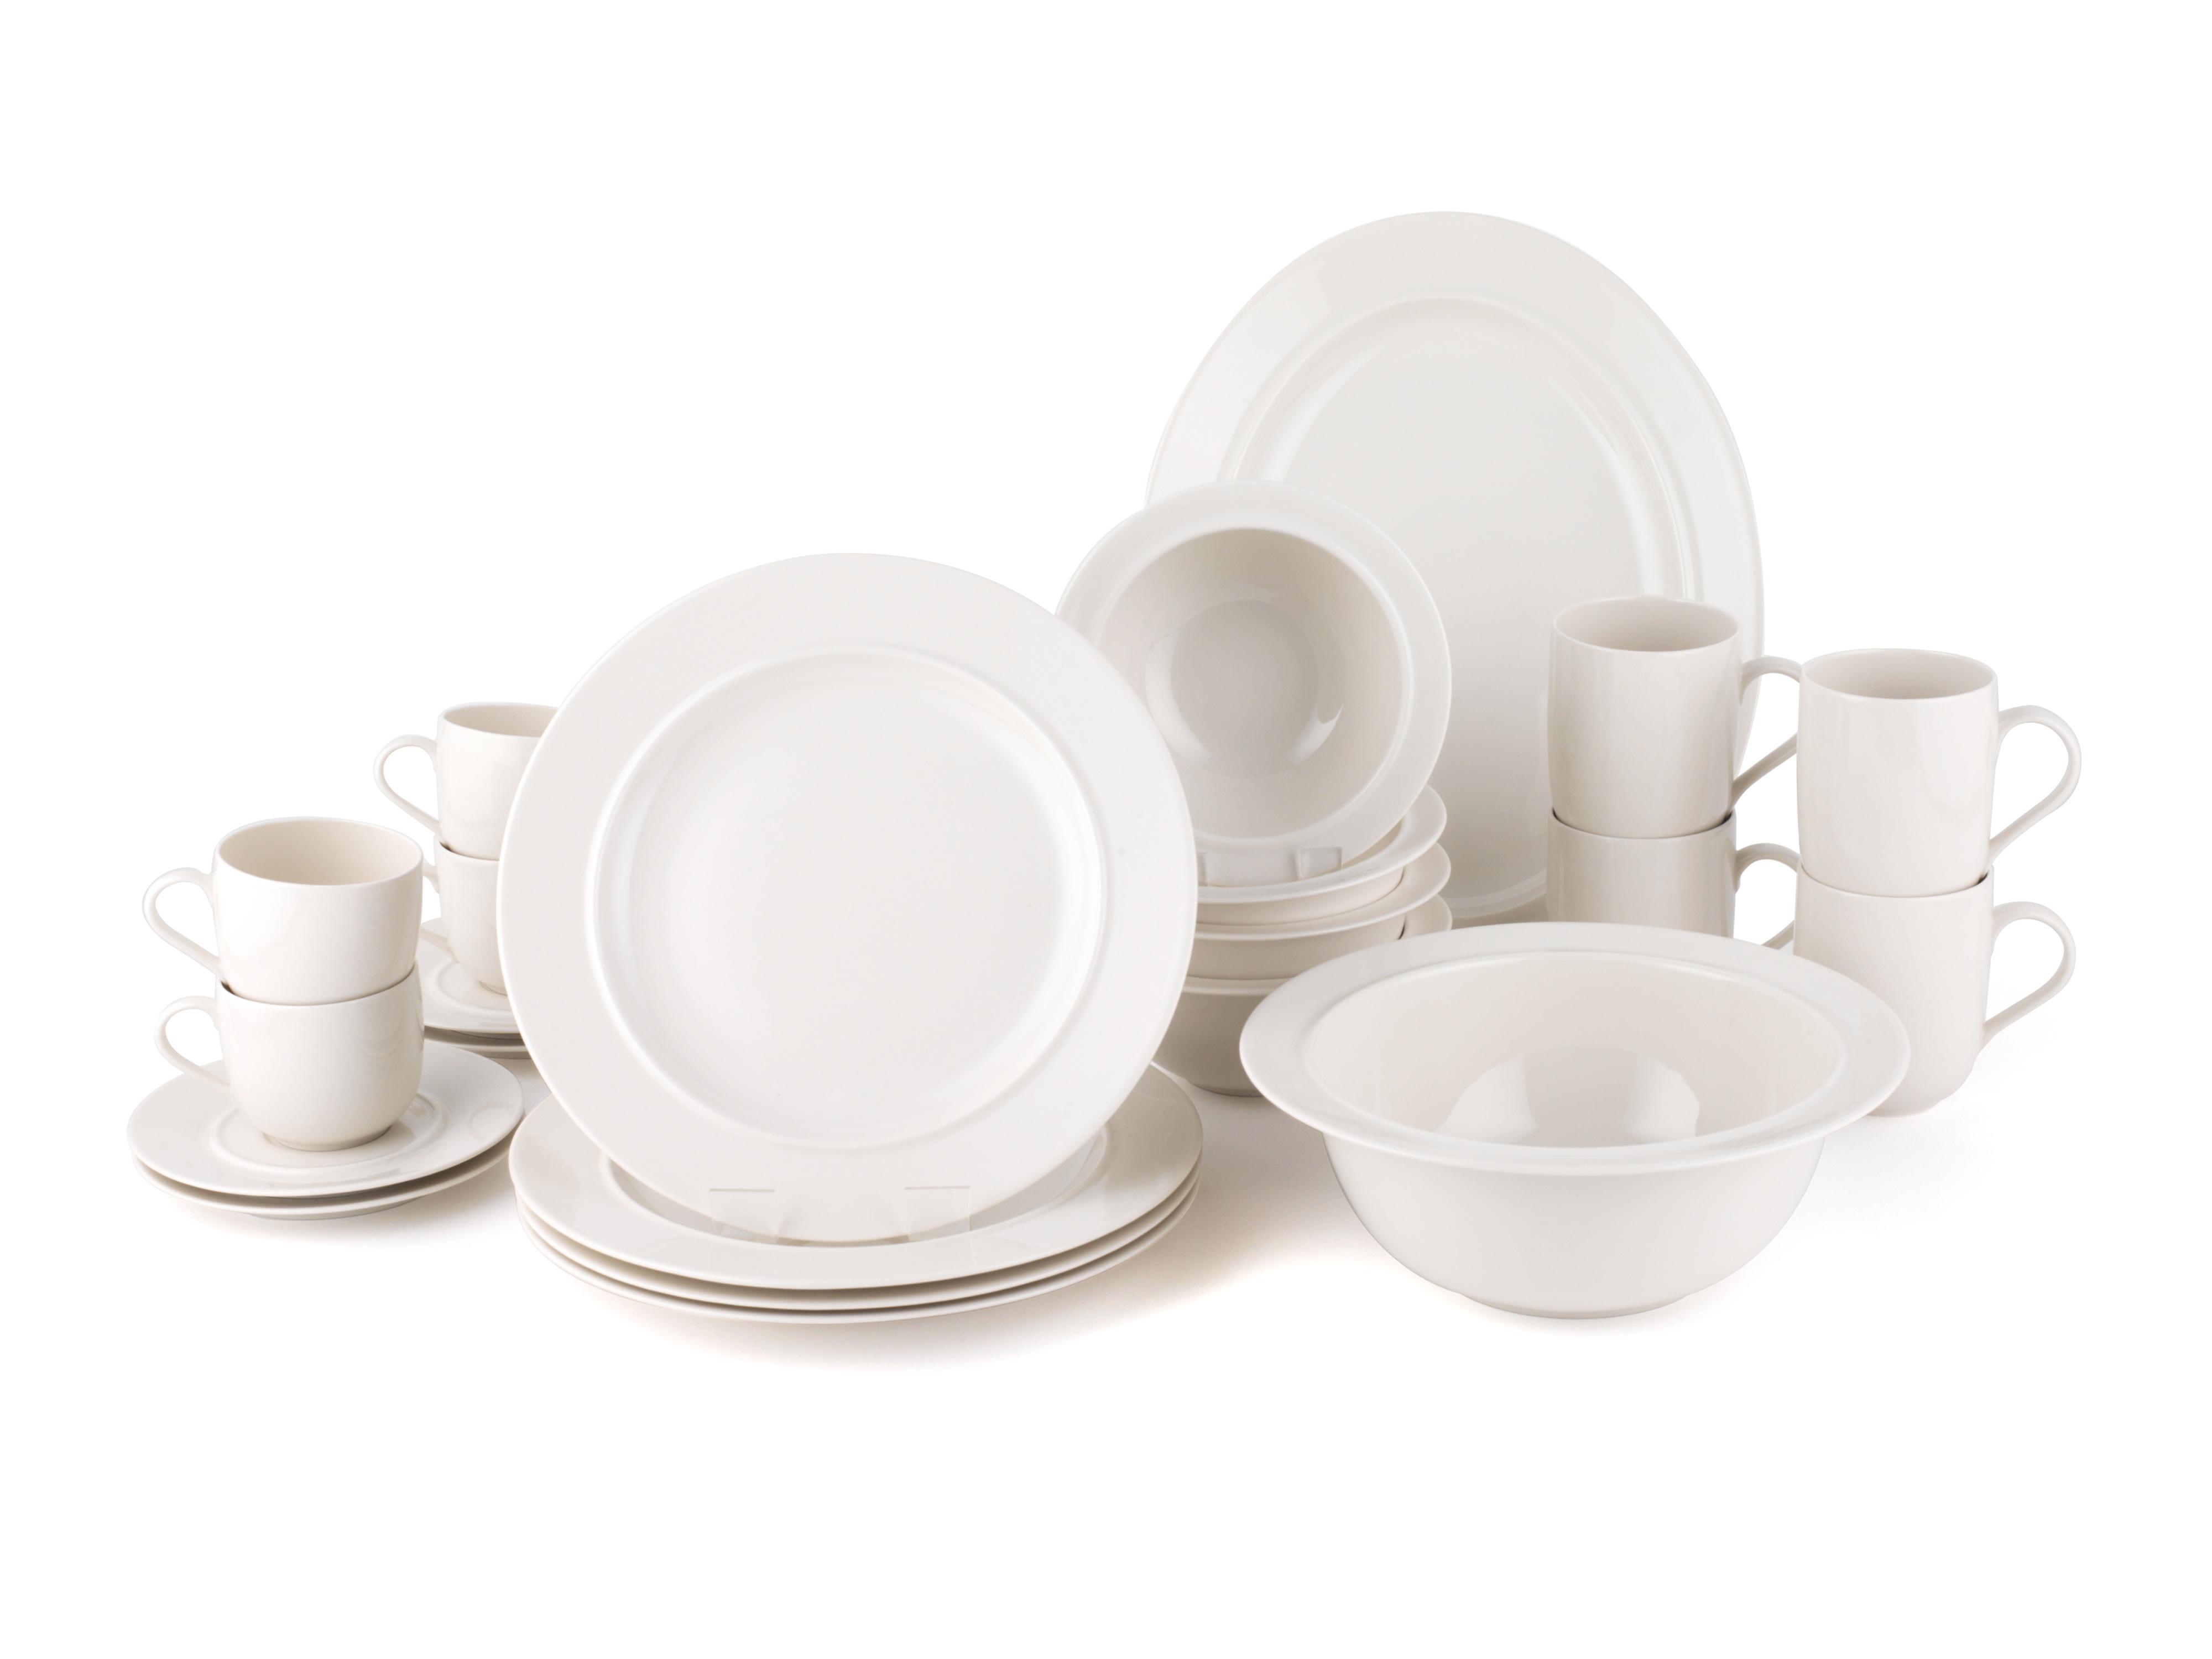 Alessi La Bella Tavola Porcelain 4 Place Setting Dining Set With Serving Bowl Serving Platter No1brands4you